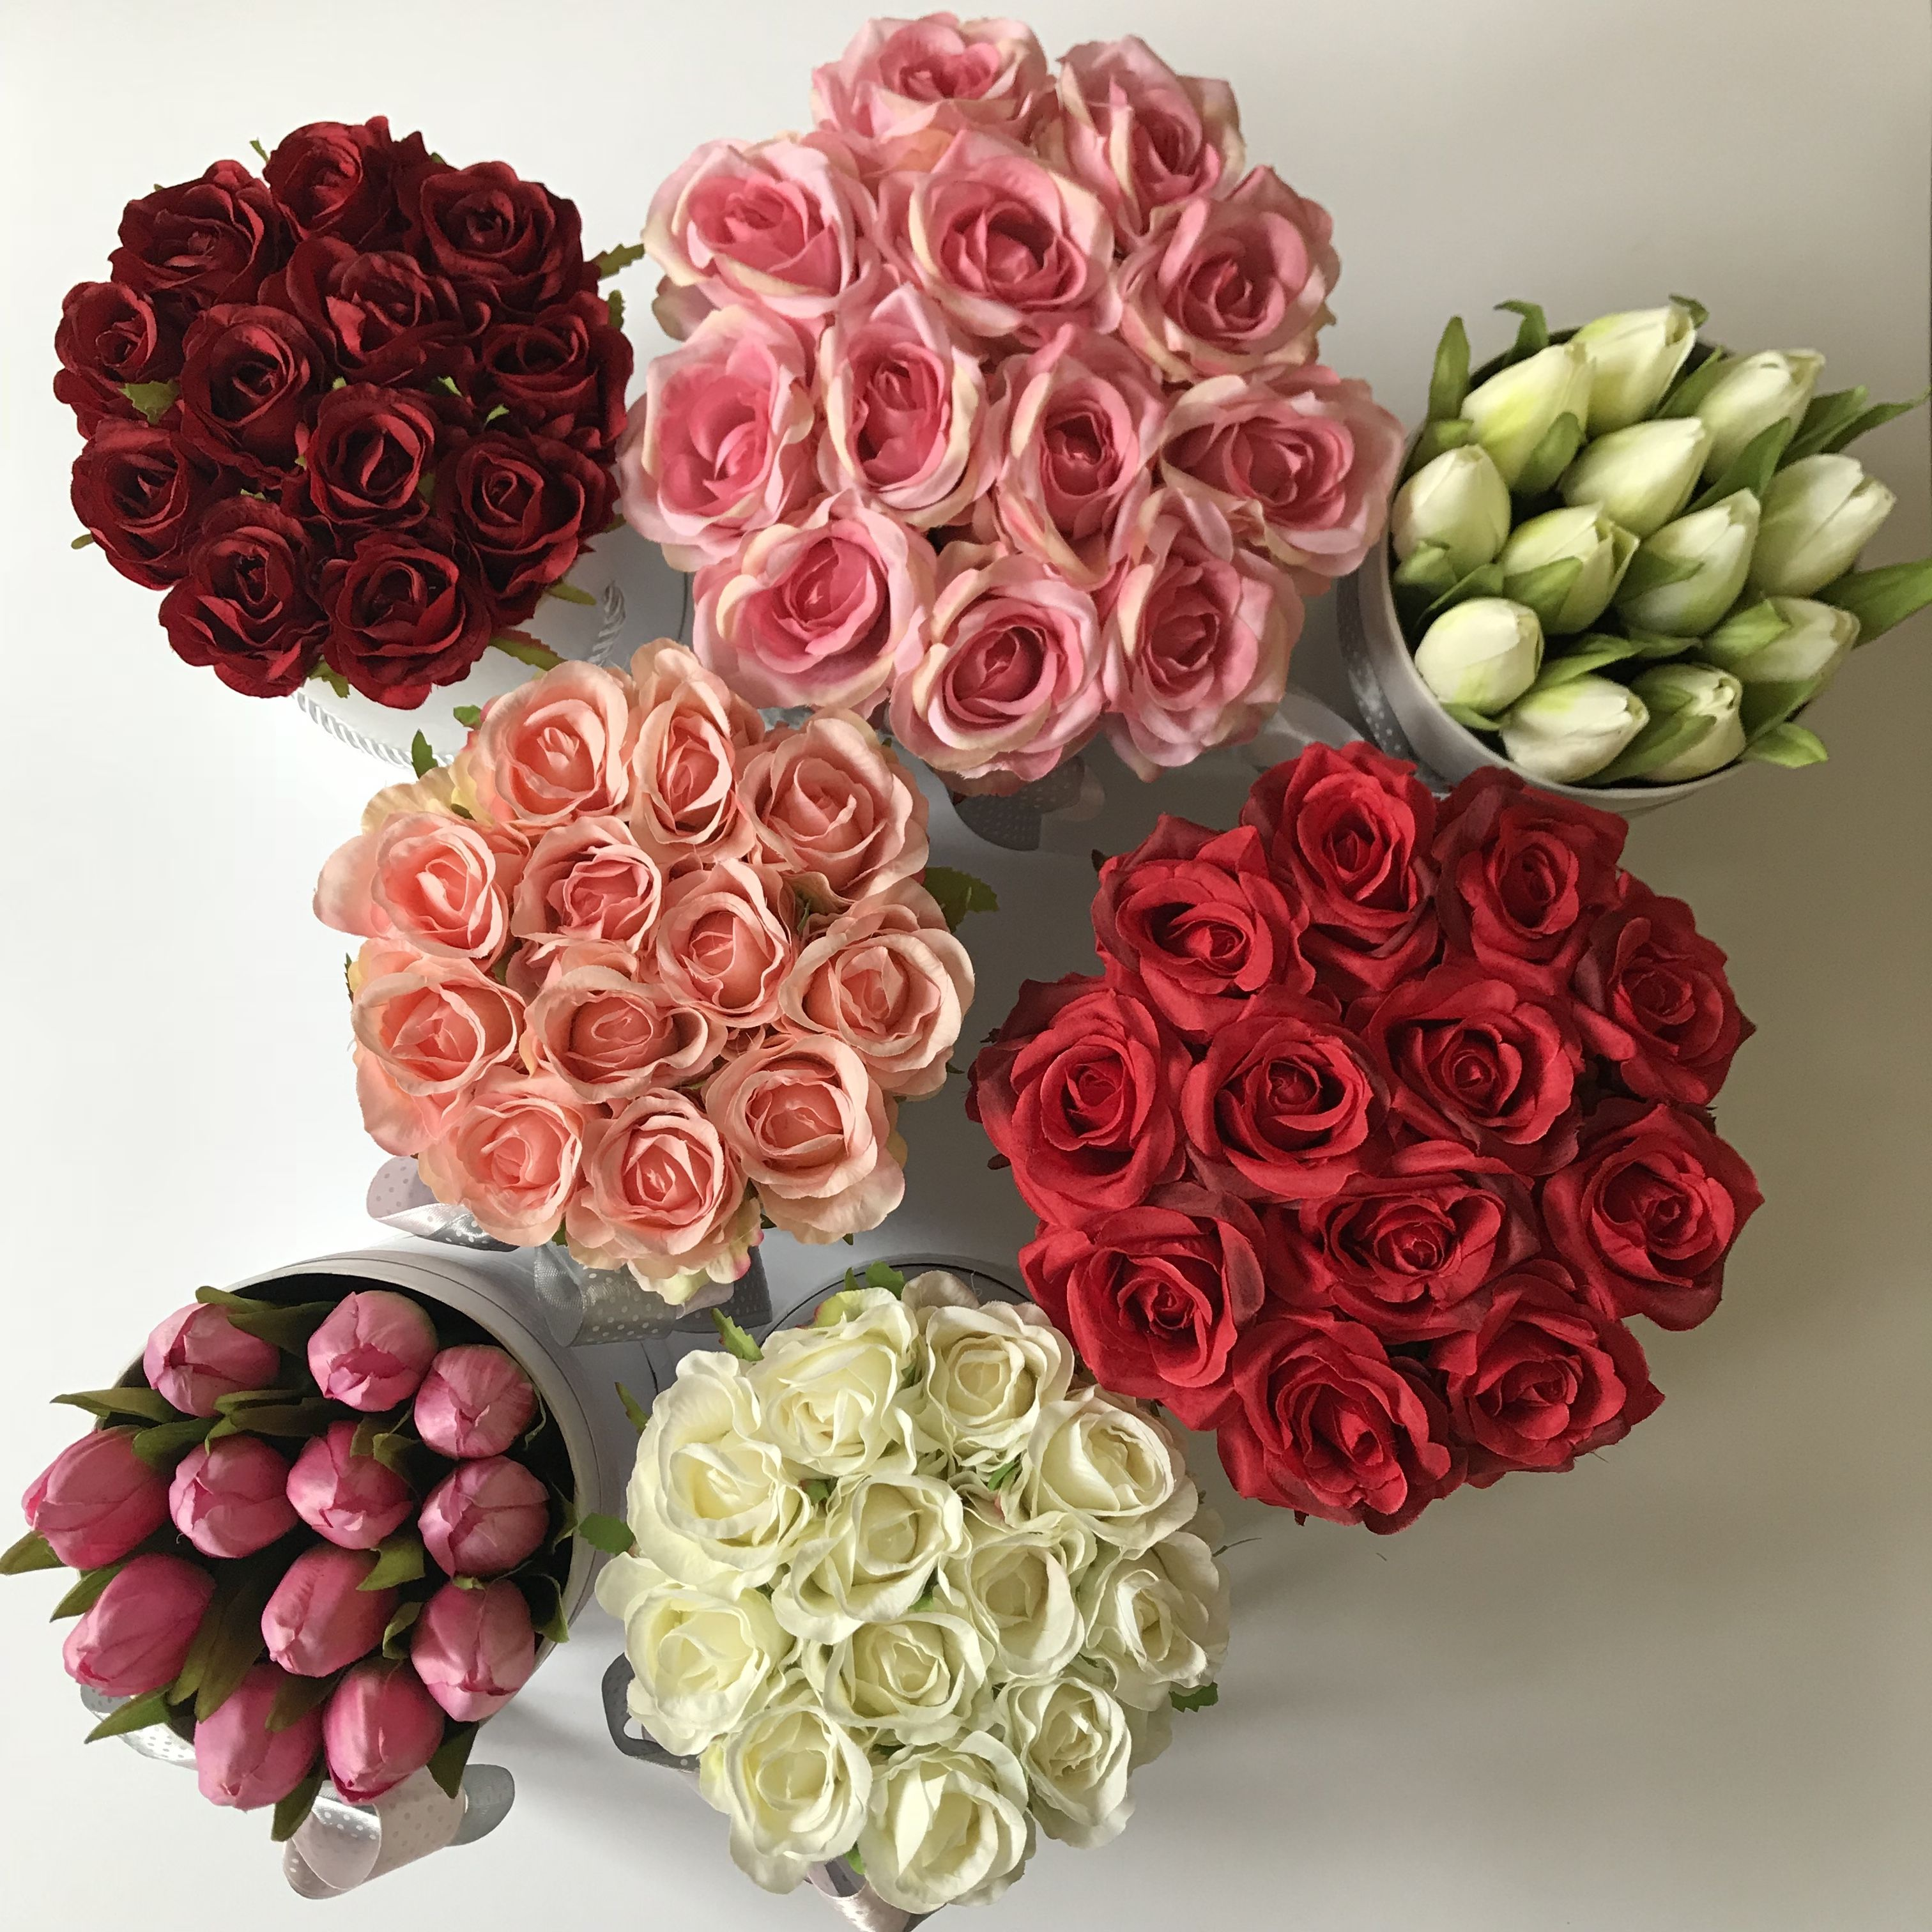 Flowerbox Flower Box Roses Box Of Flowers Roses In A Box Fashion Wedding Idea Bloom Des Fleur Maison Des Fleur Hom Luxury Flowers Trendy Flowers Flower Boxes